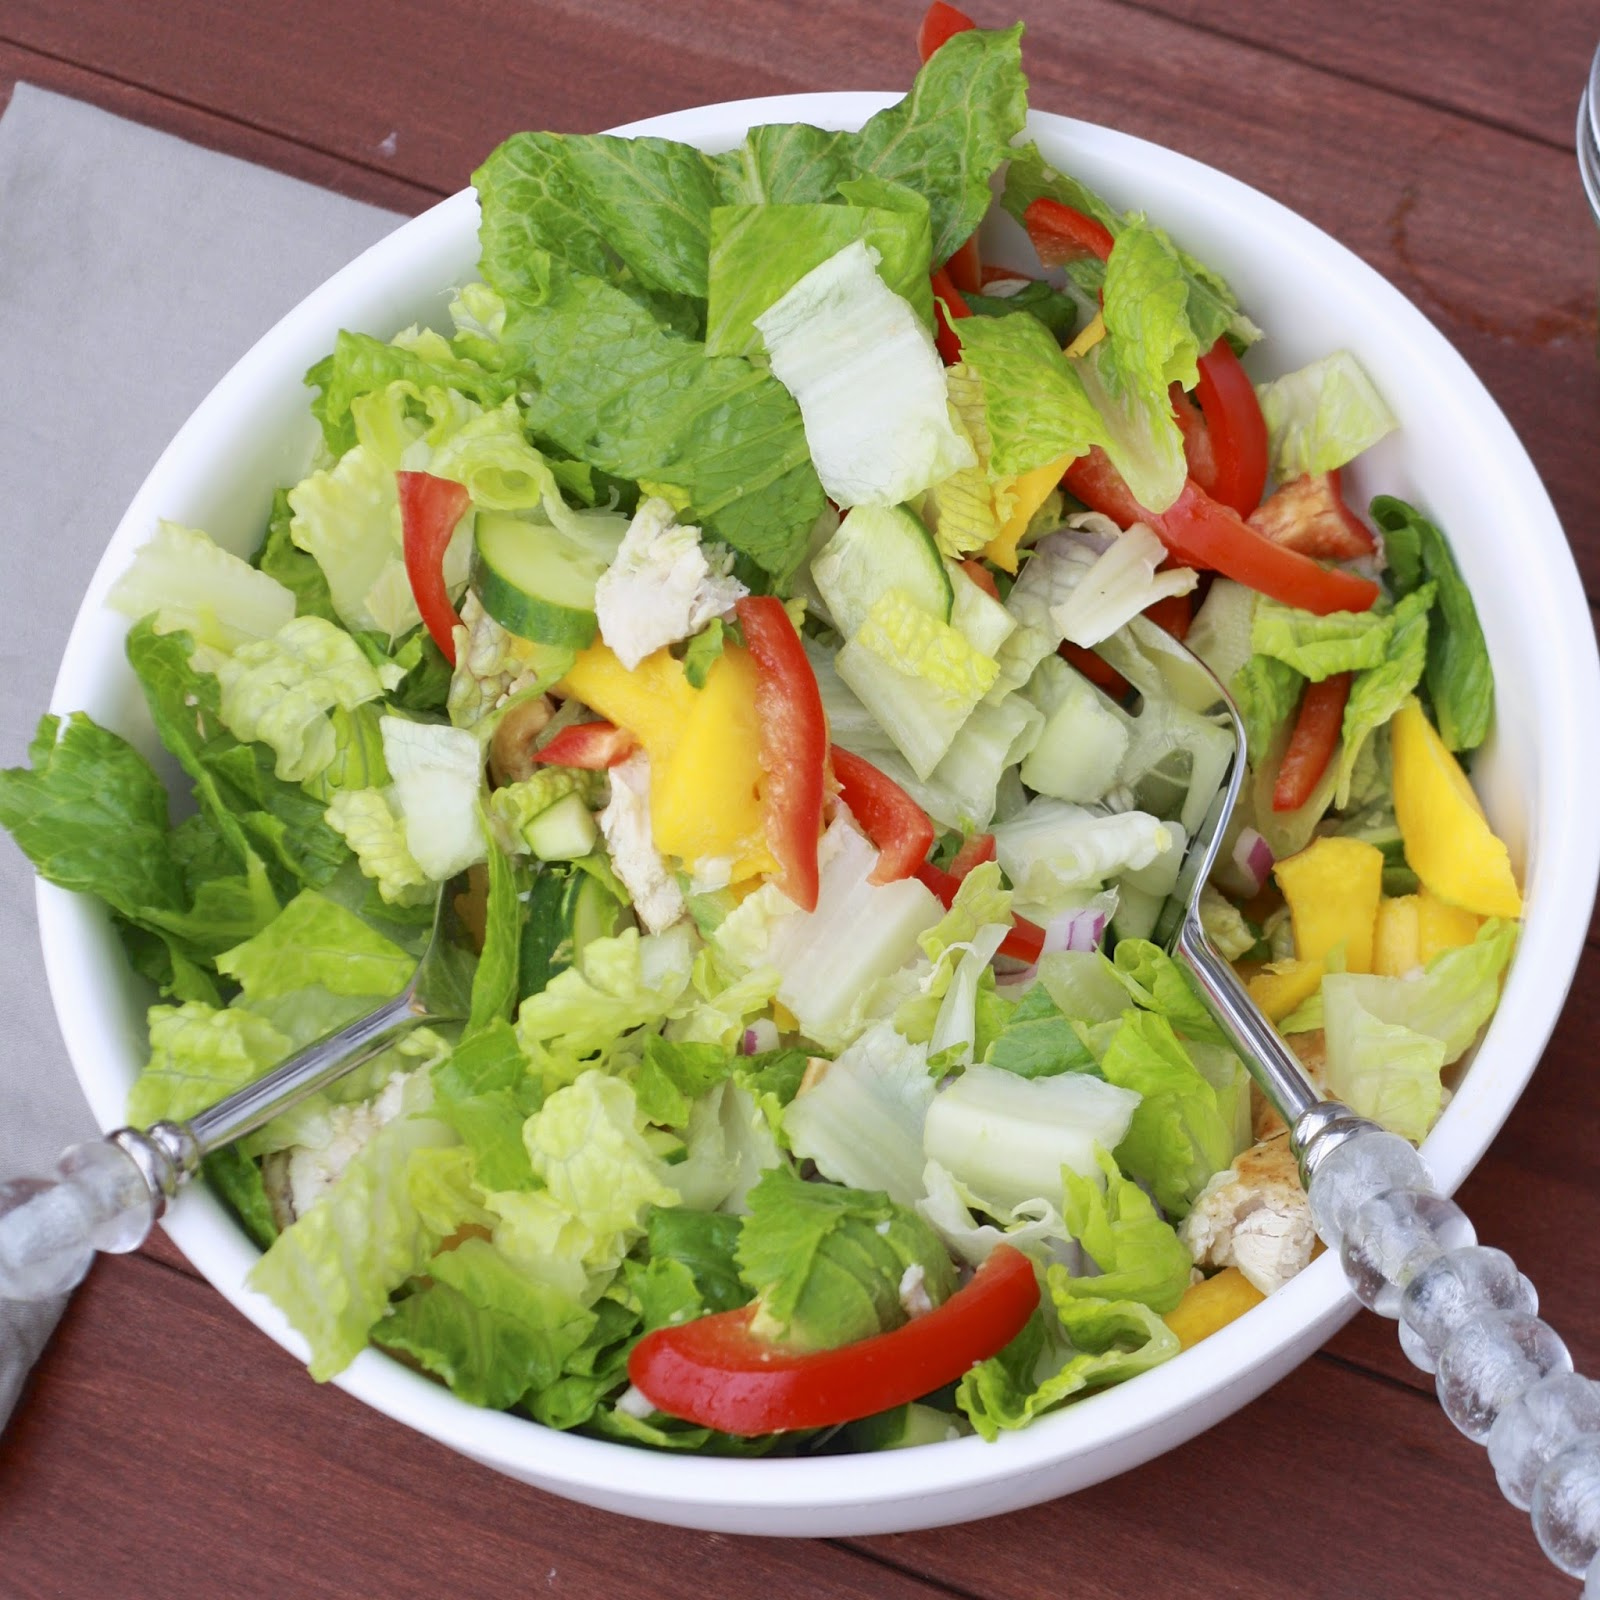 Chopped Mango Chicken Salad with Jalapeno Cilantro Vinaigrette | The Sweets Life